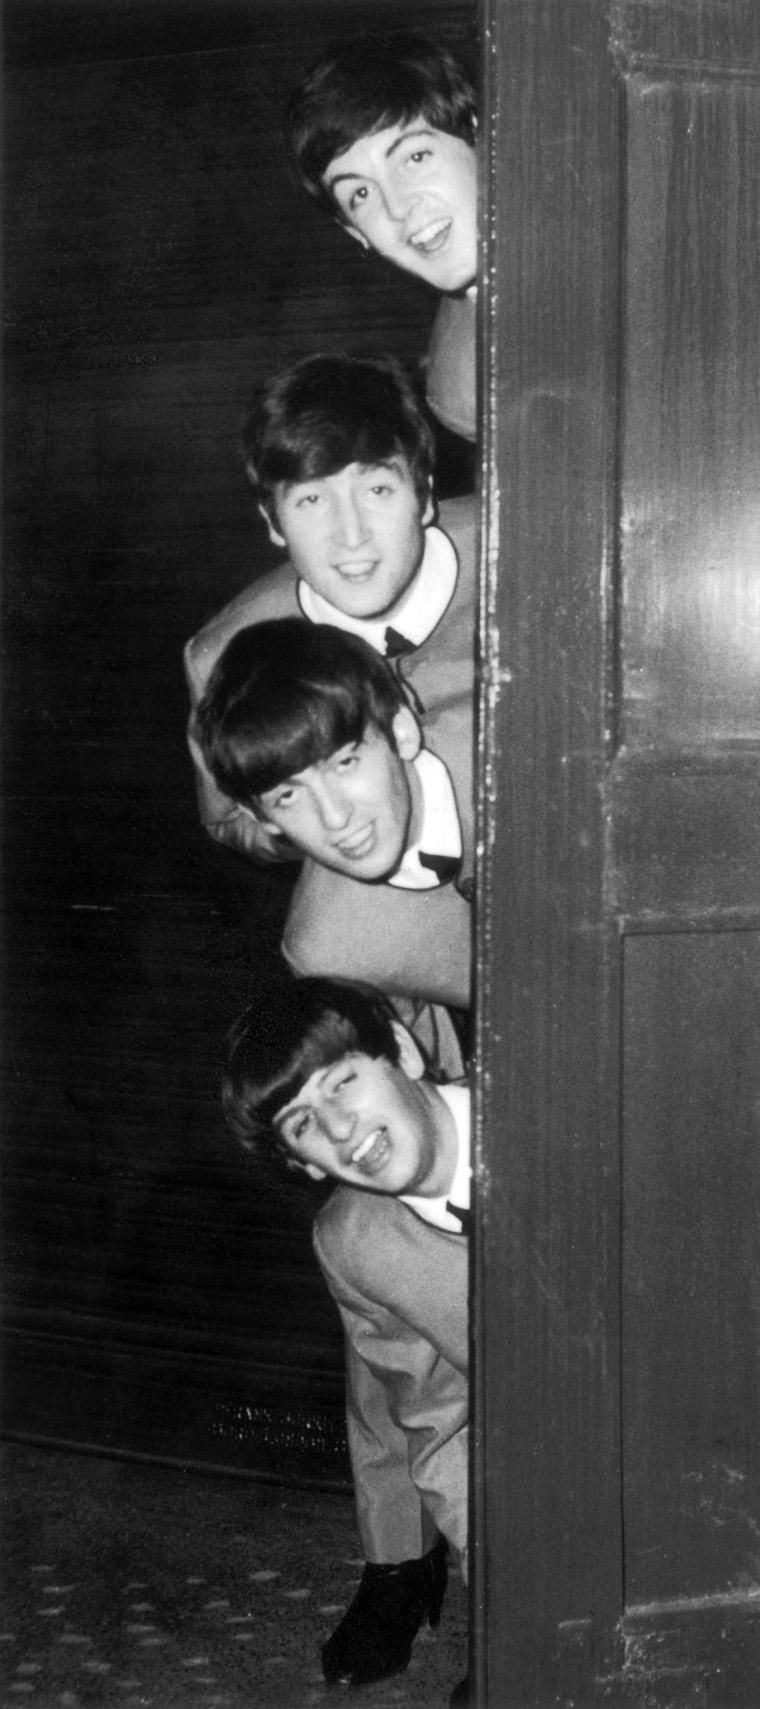 Beatles Backstage